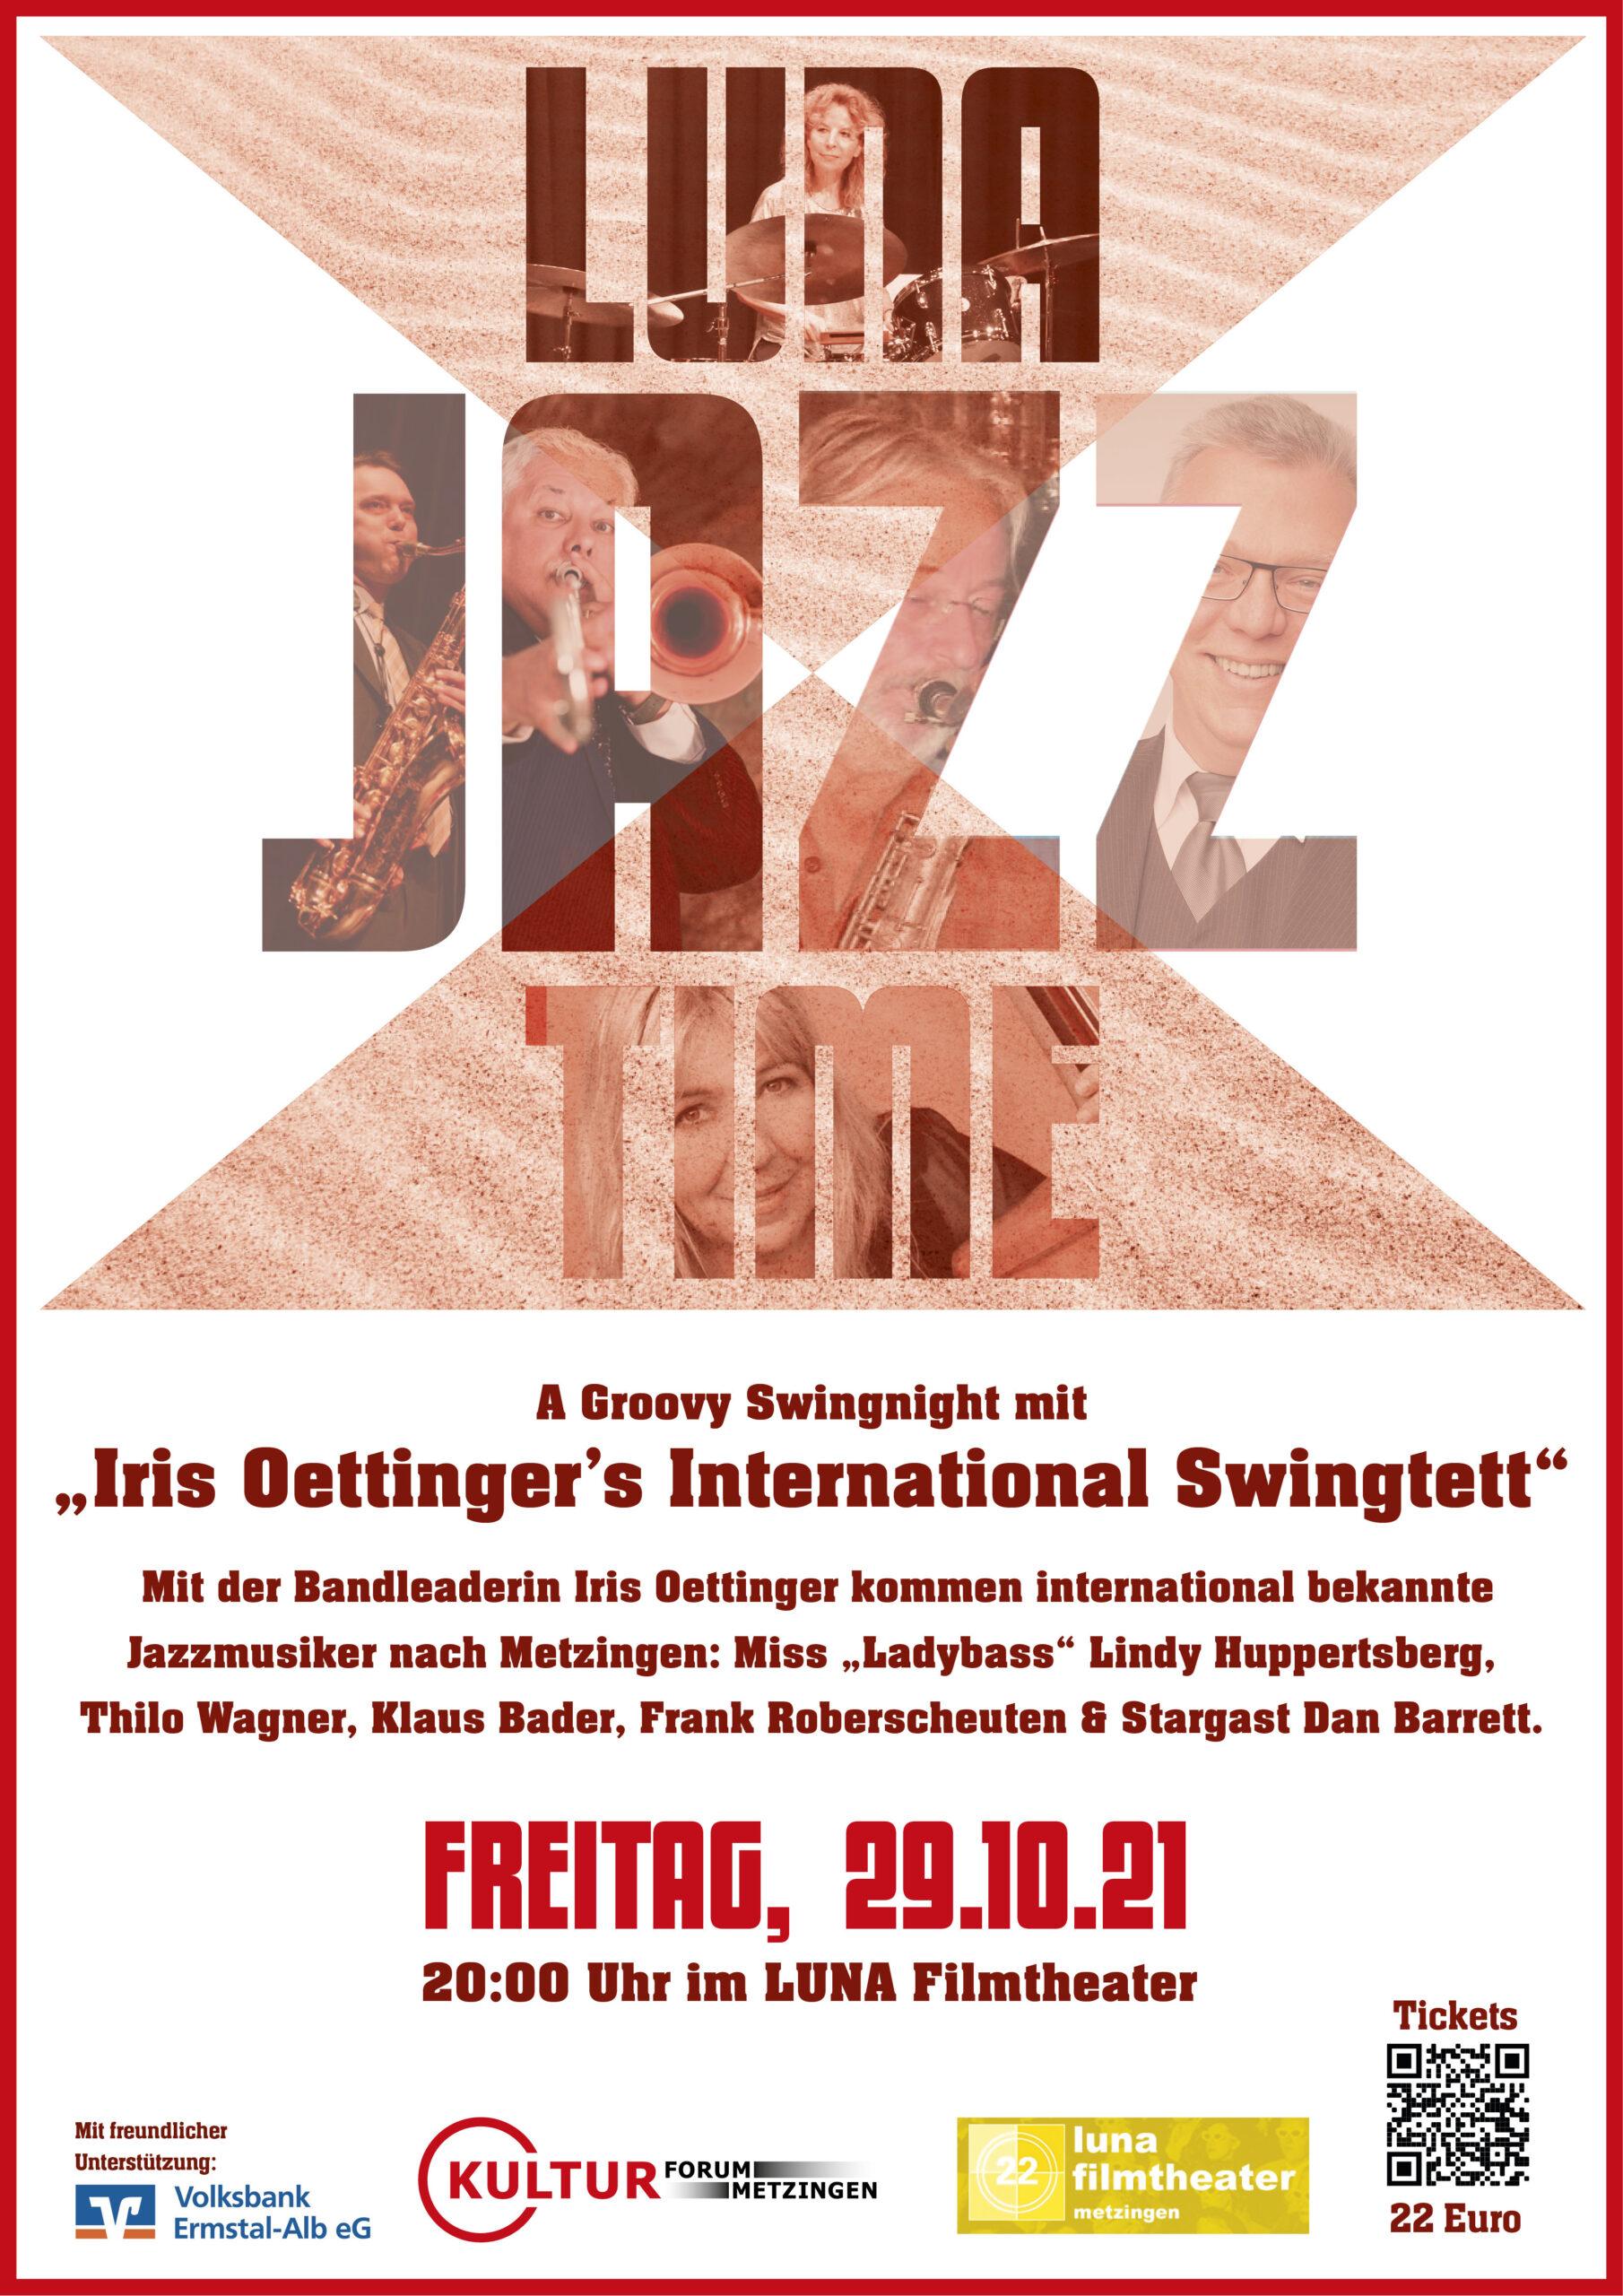 29.10.2021 20:00 Uhr Luna Filmtheater Eisenbahnstr. 19 72555 Metzingen: Iris Oettingers International Swingtett